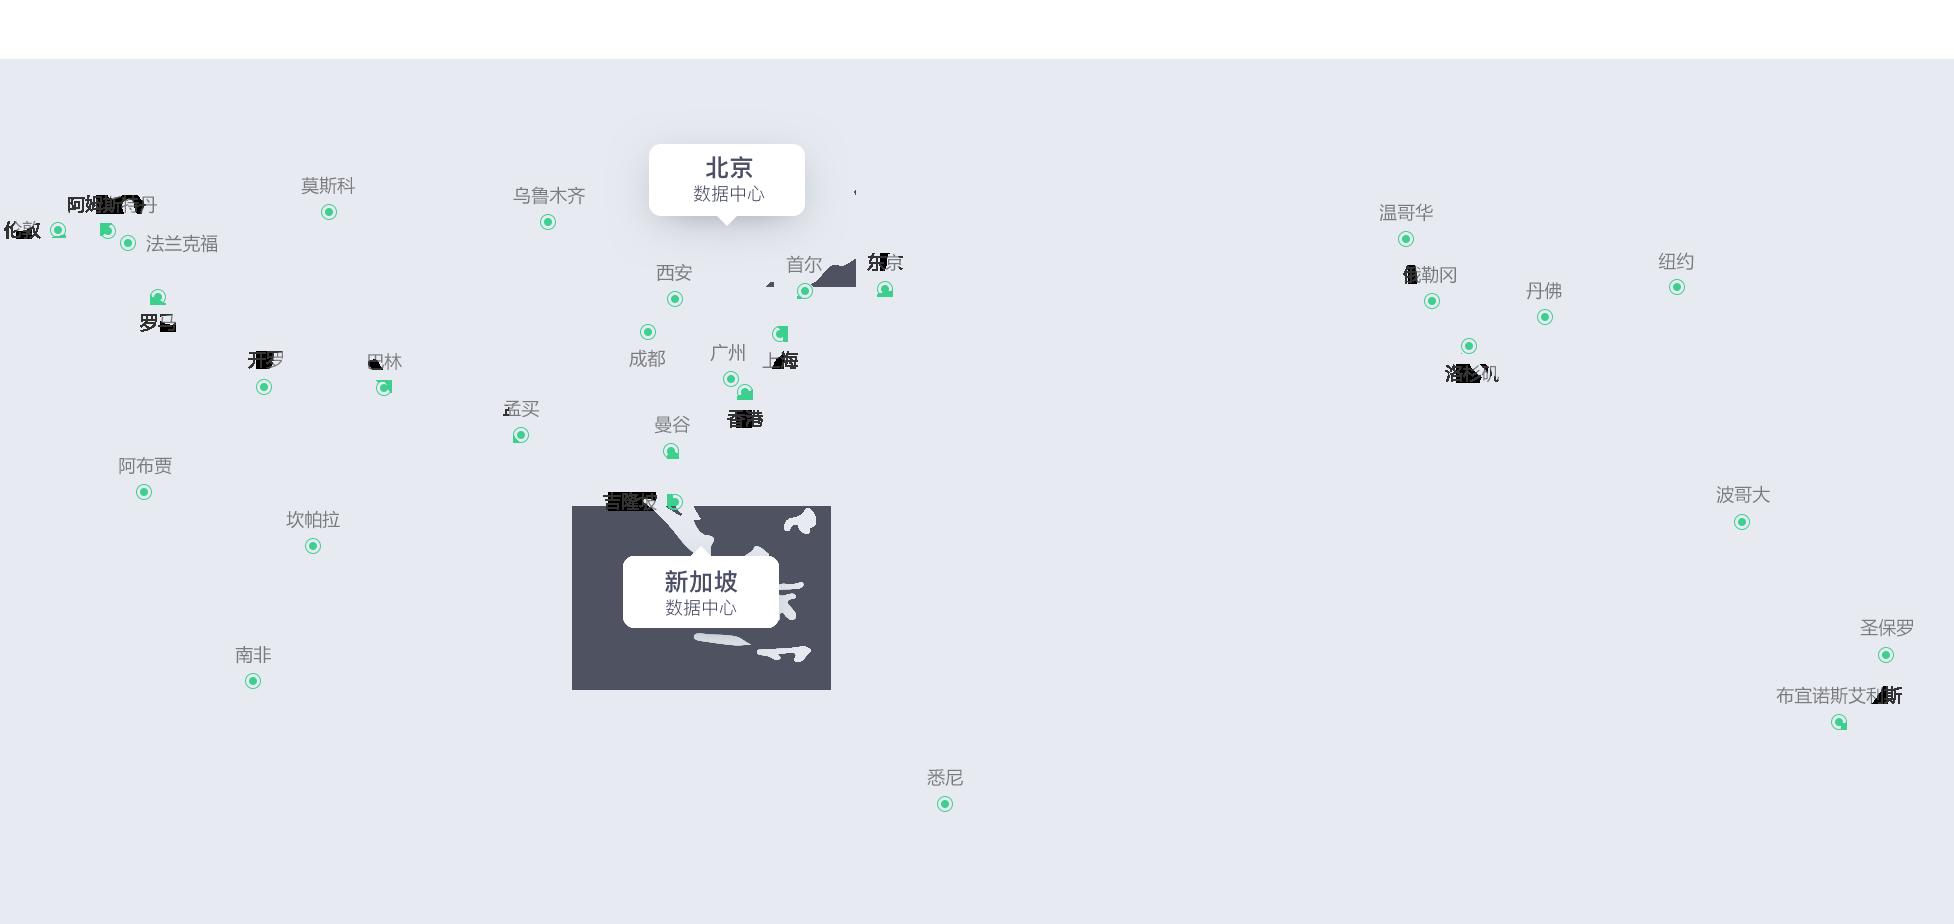 RTC技术是流媒体云时代的桥与路 融云通过IM+RTC+推送打通应用场景